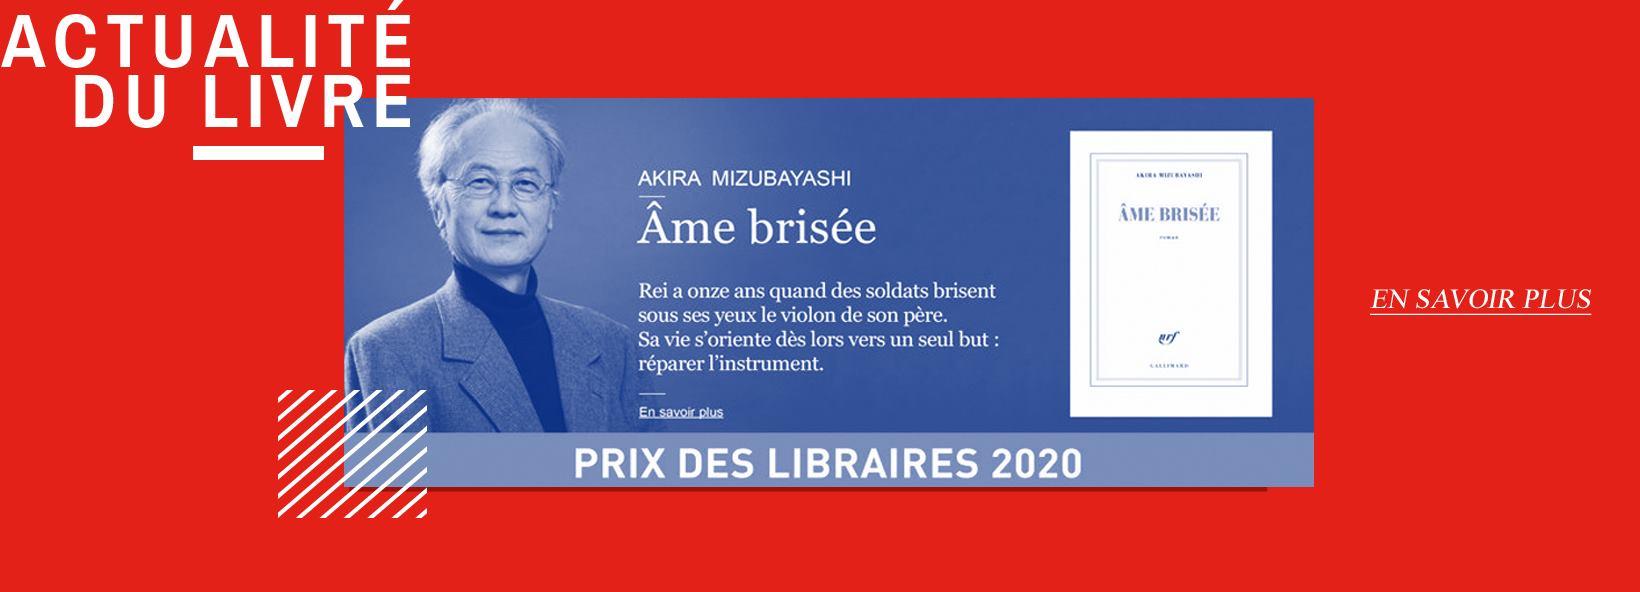 Akira Mizubayashi- Prix des libraires 2020